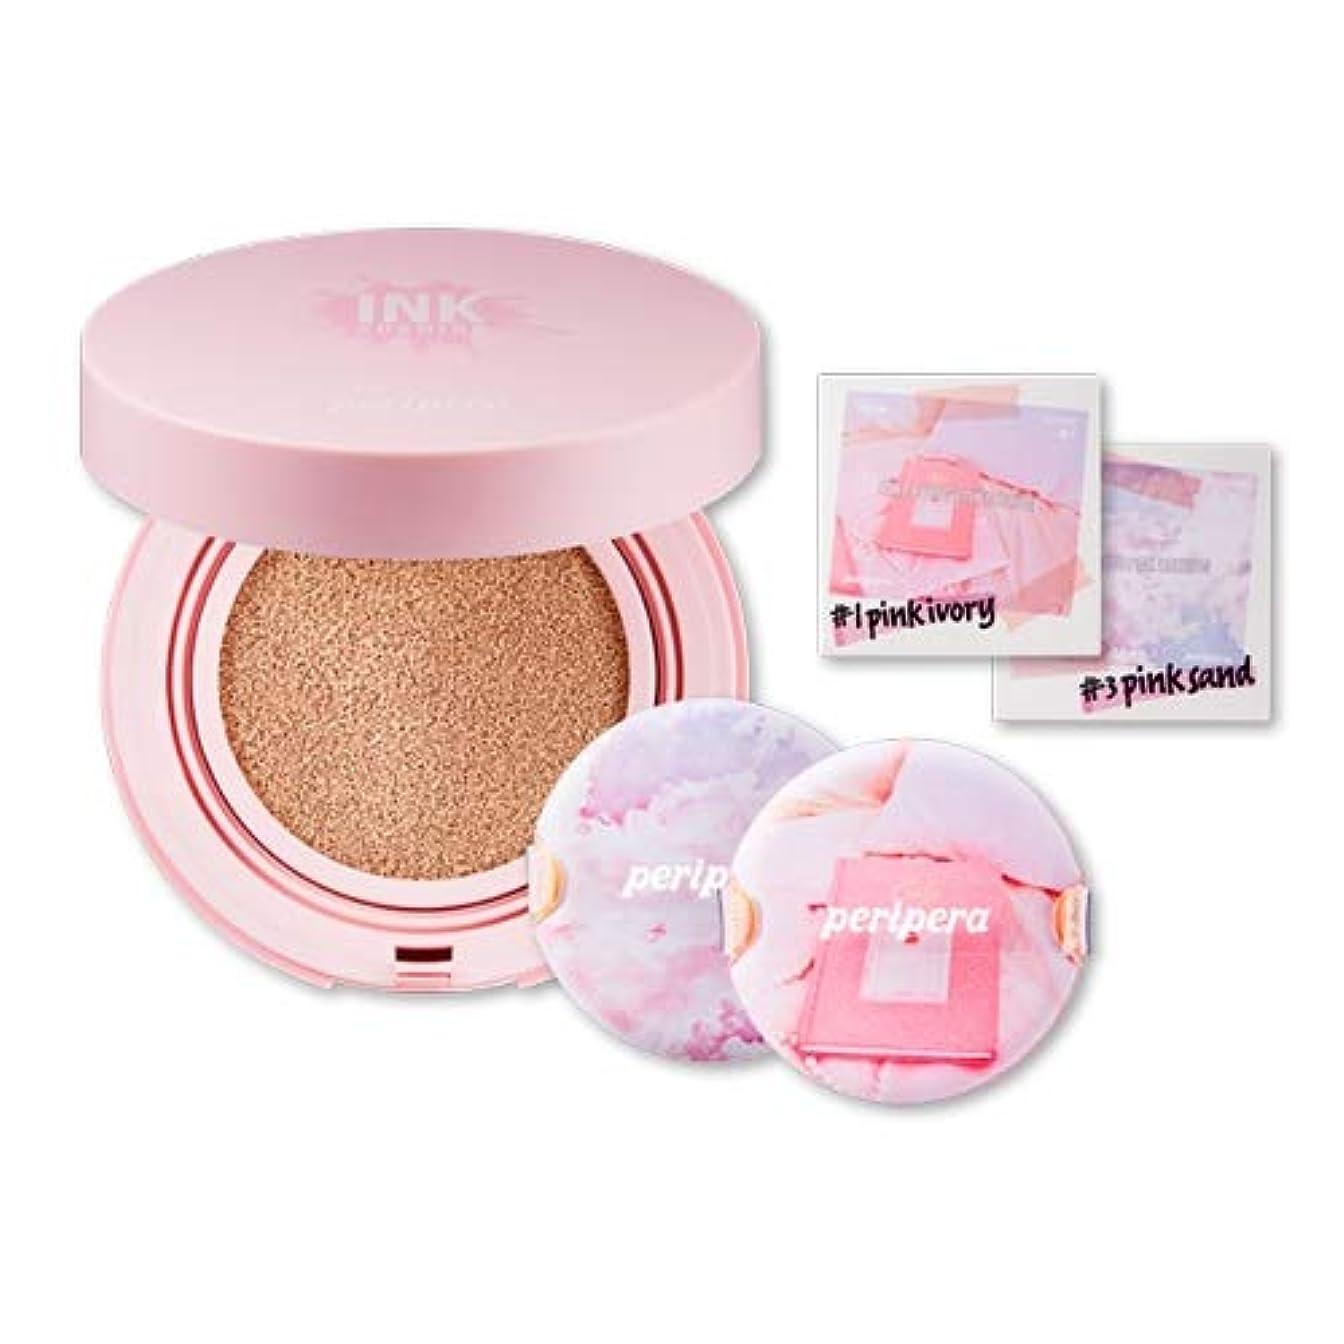 Peripera ペリペラ [ピンクの瞬間] インクラスティング ピンク クッション [Pink-Moment] Inklasting Pink Cushion (#1 Pink Ivory) [並行輸入品]